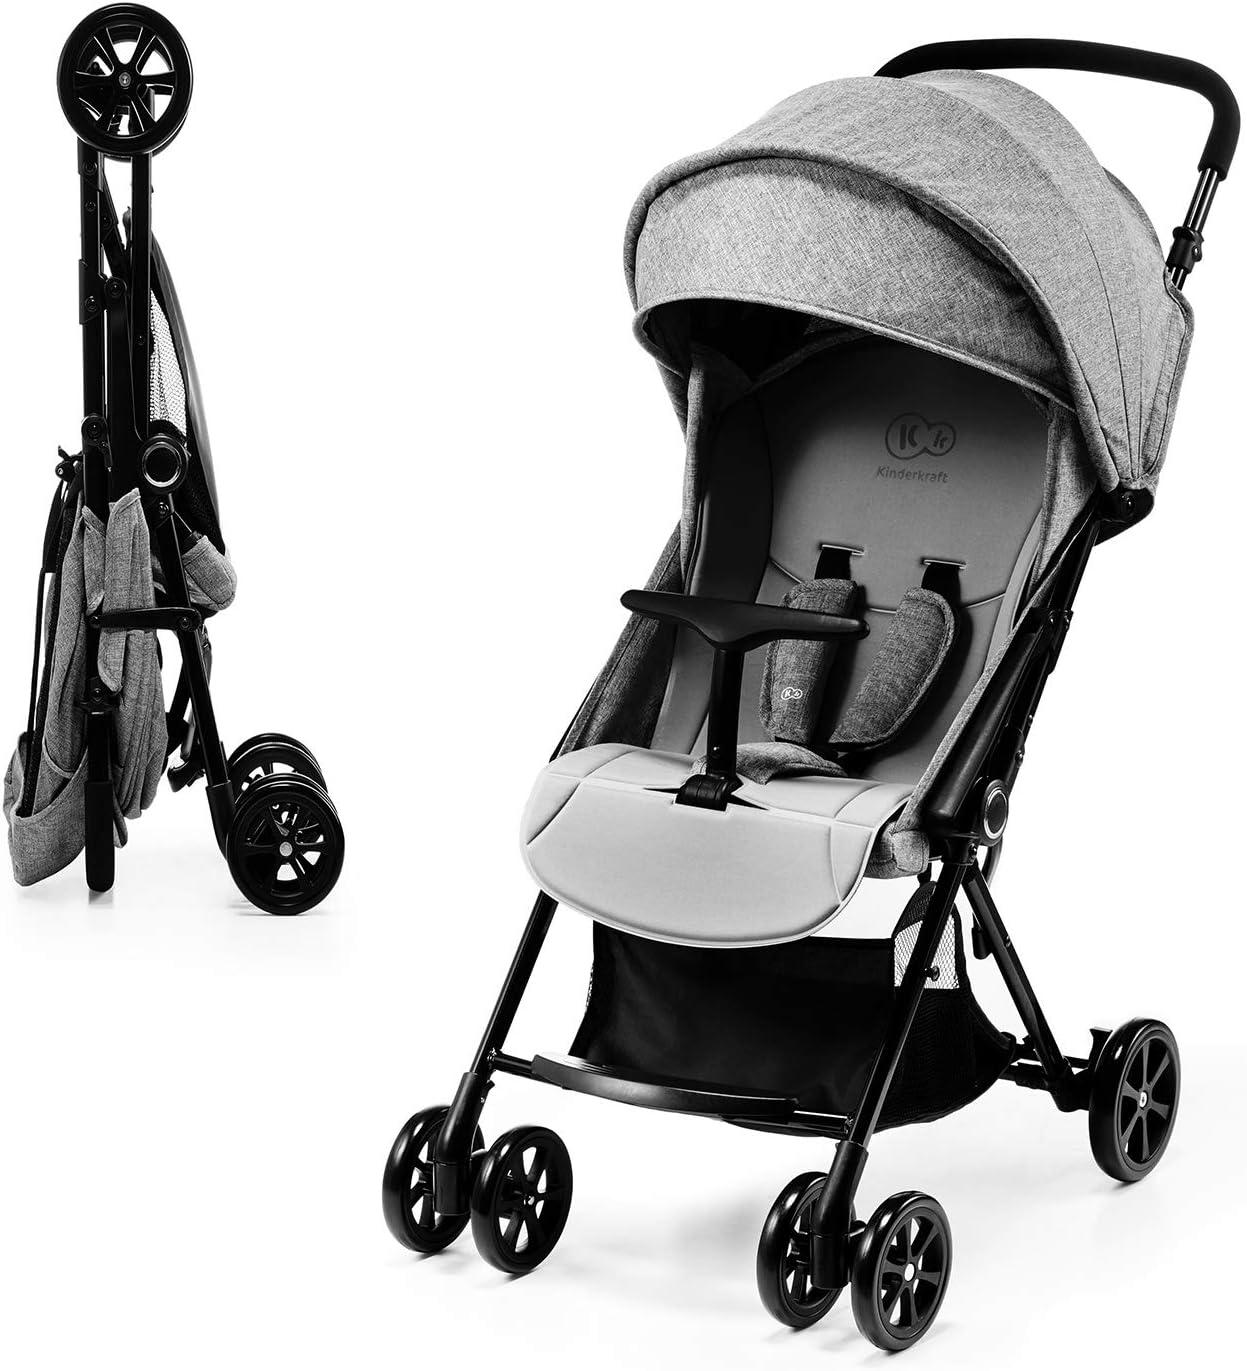 KK Kinderkraft Lite Up Cochecito de bebé, color gris